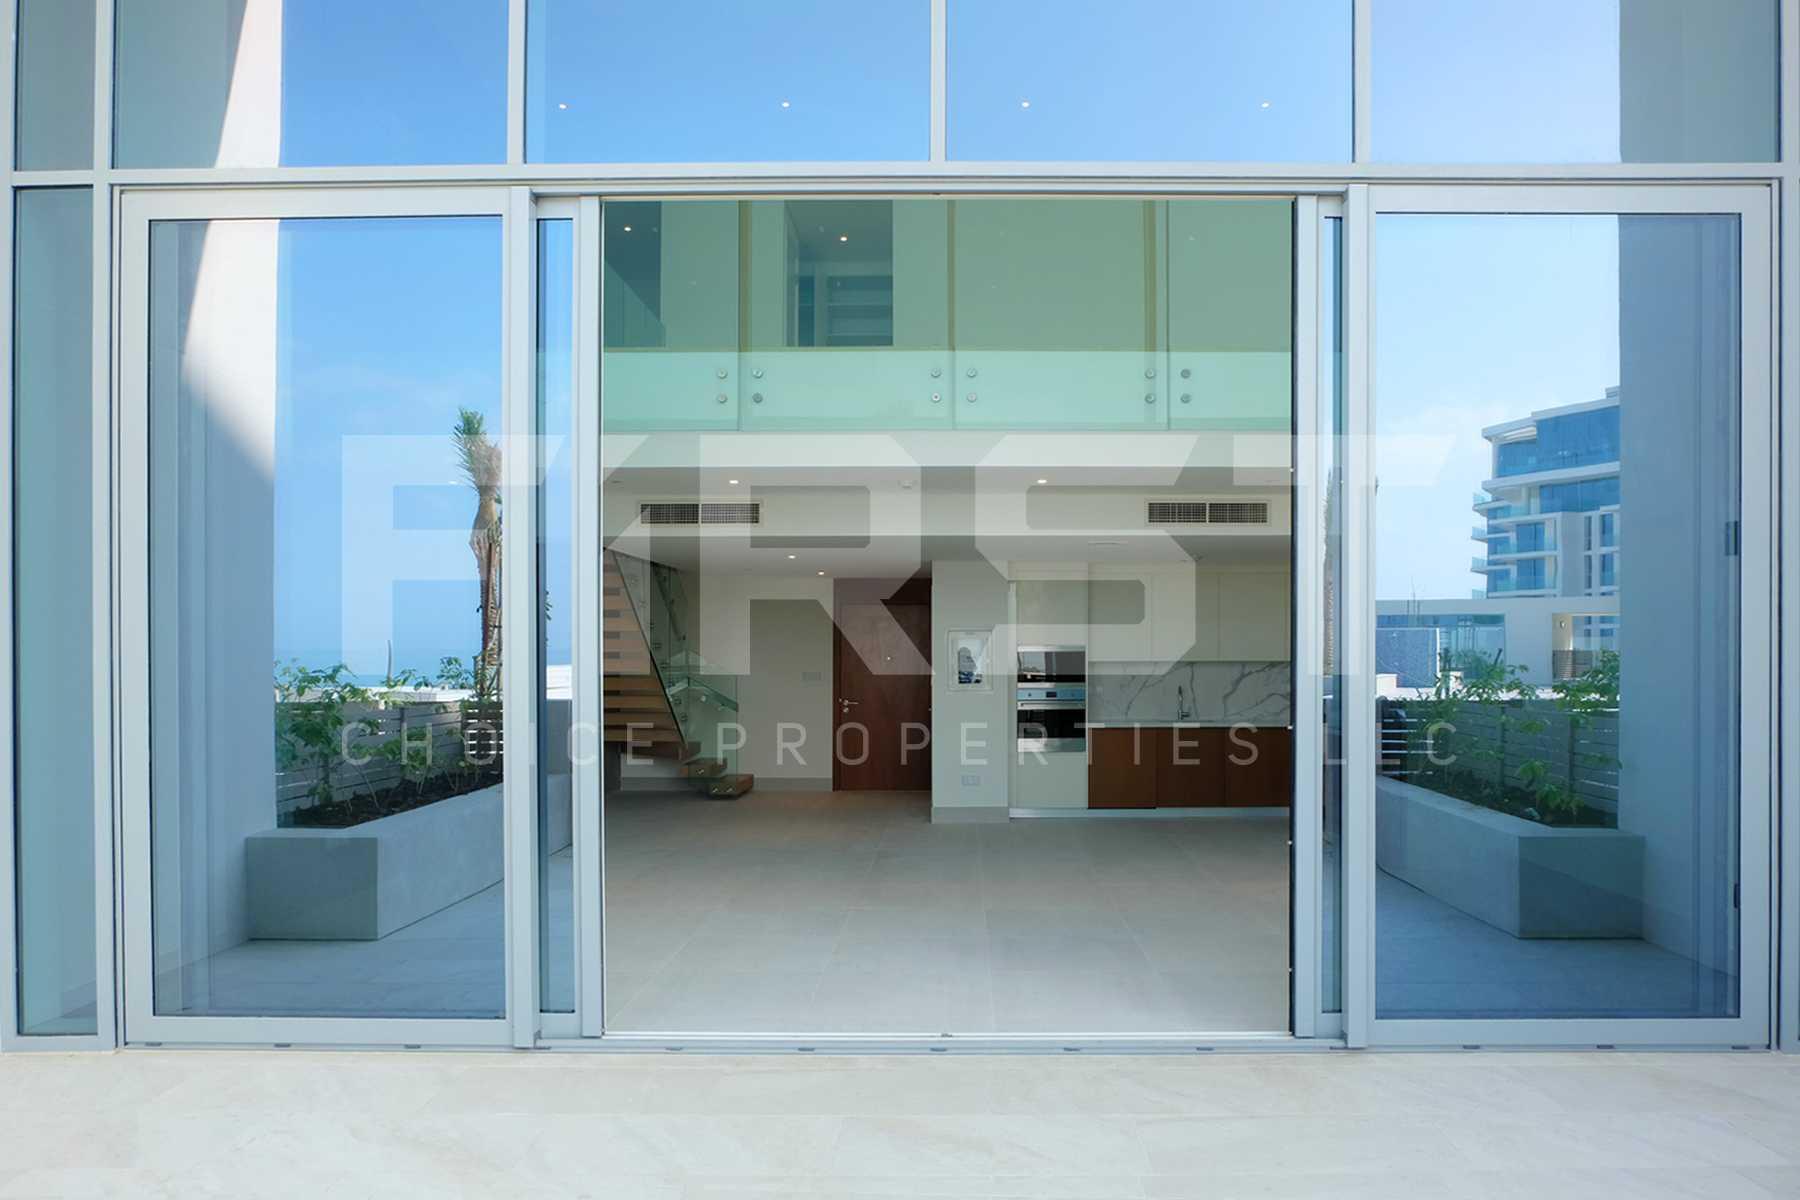 Internal Photo of 1 Bedroom Loft Apartment in Mamsha Al Saadiyat Island Abu Dhabi UAE (24).jpg